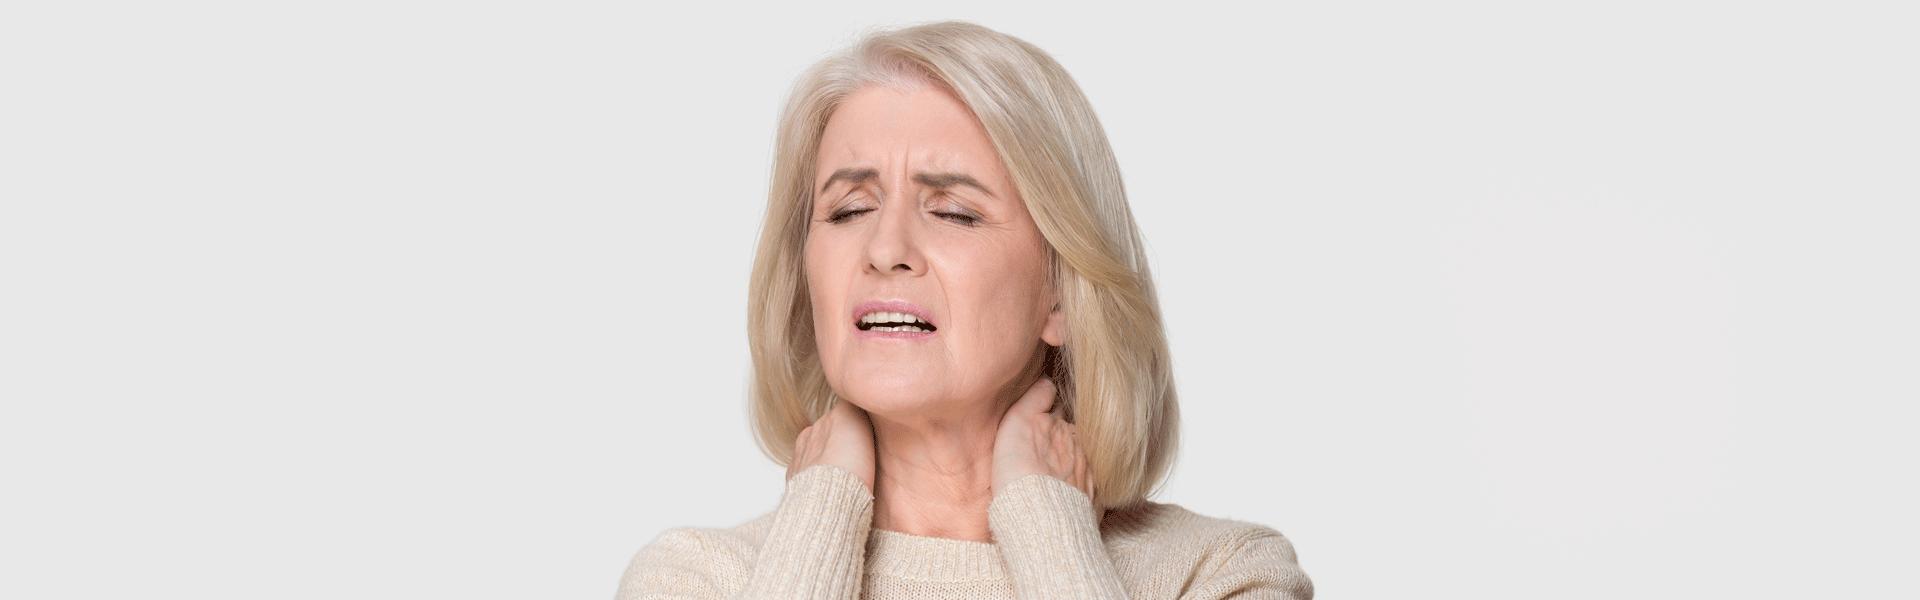 Anciano con fibromialgia